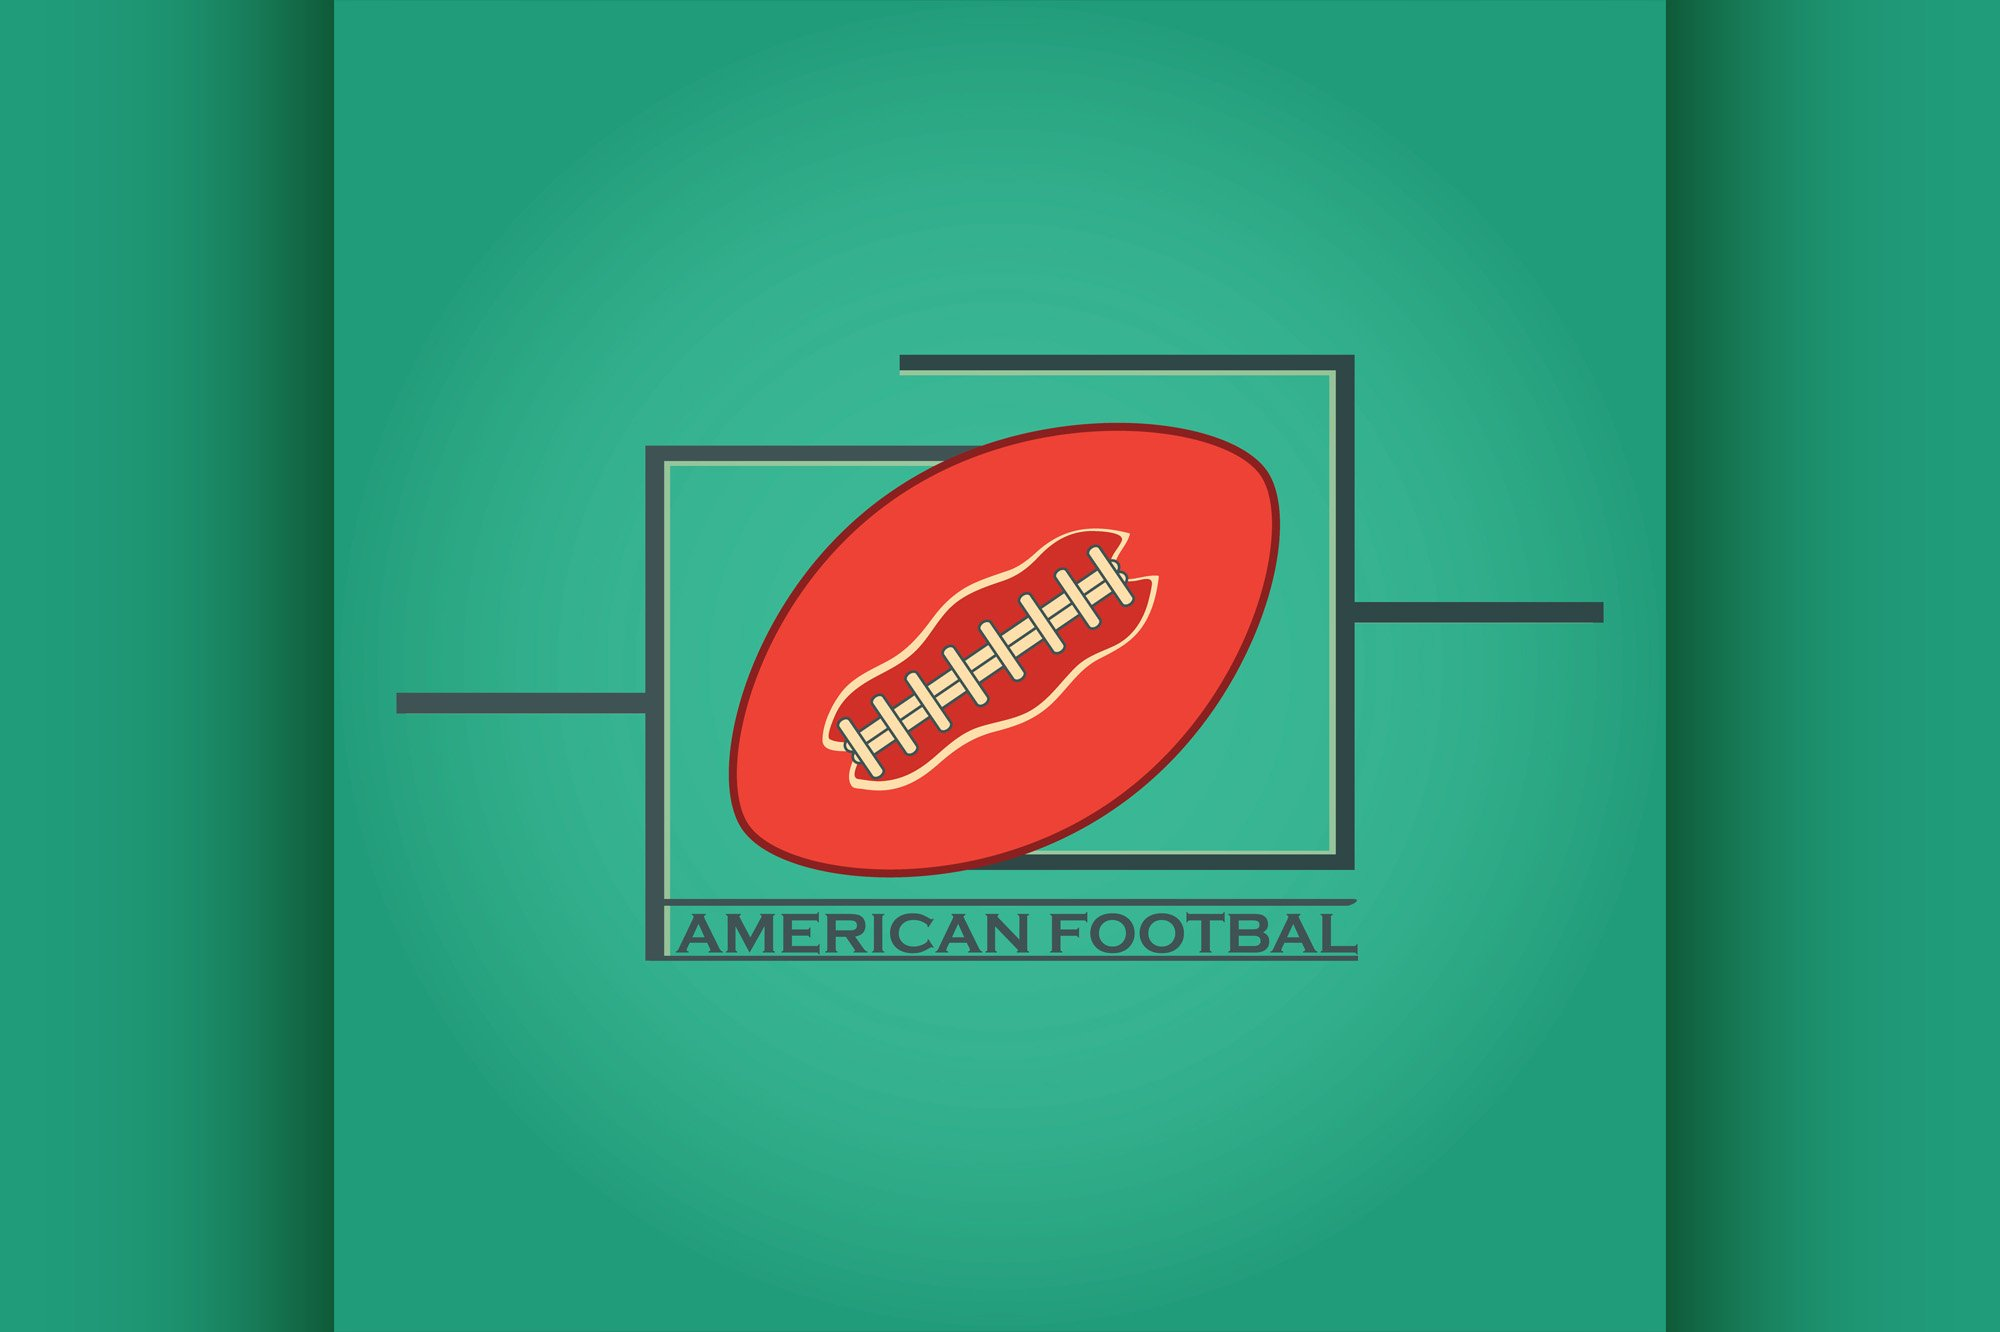 American Football logo and emblem example image 1